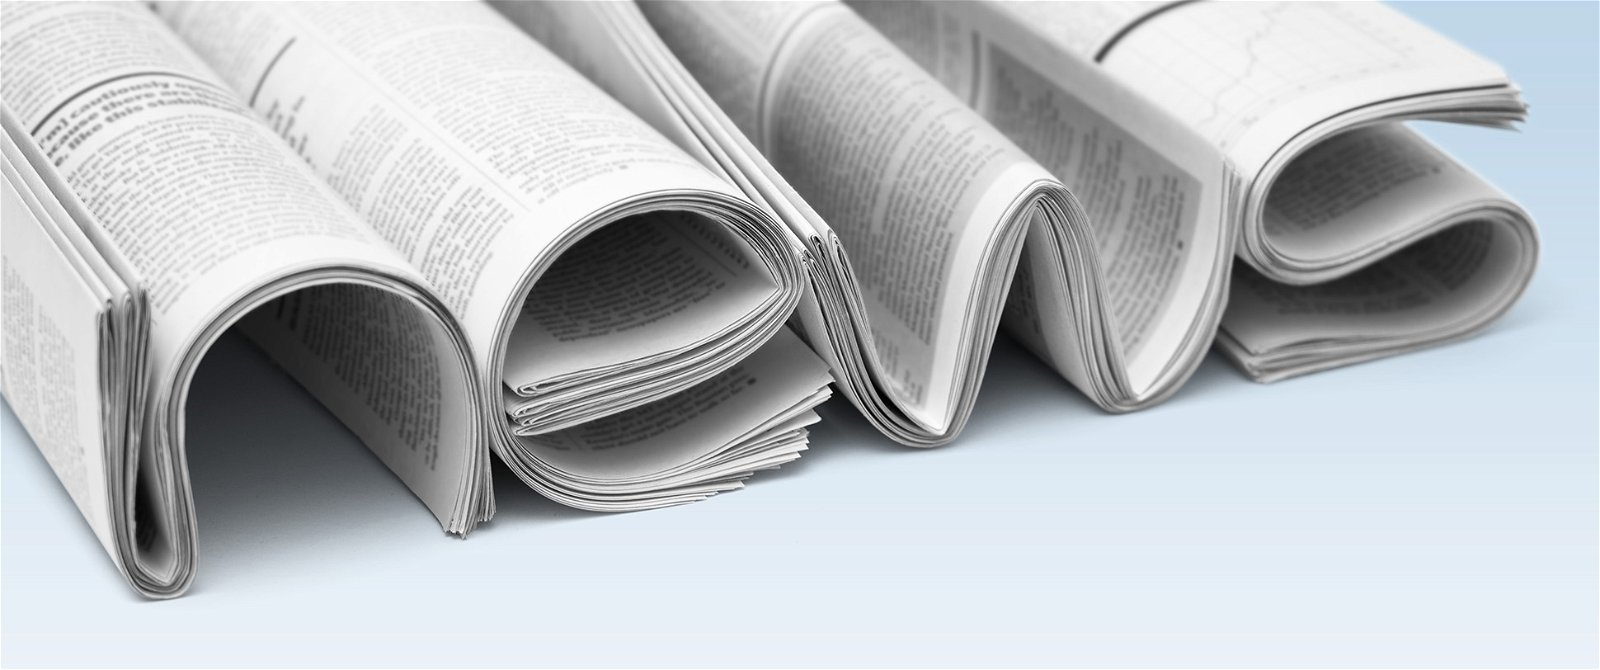 generic news - property management software